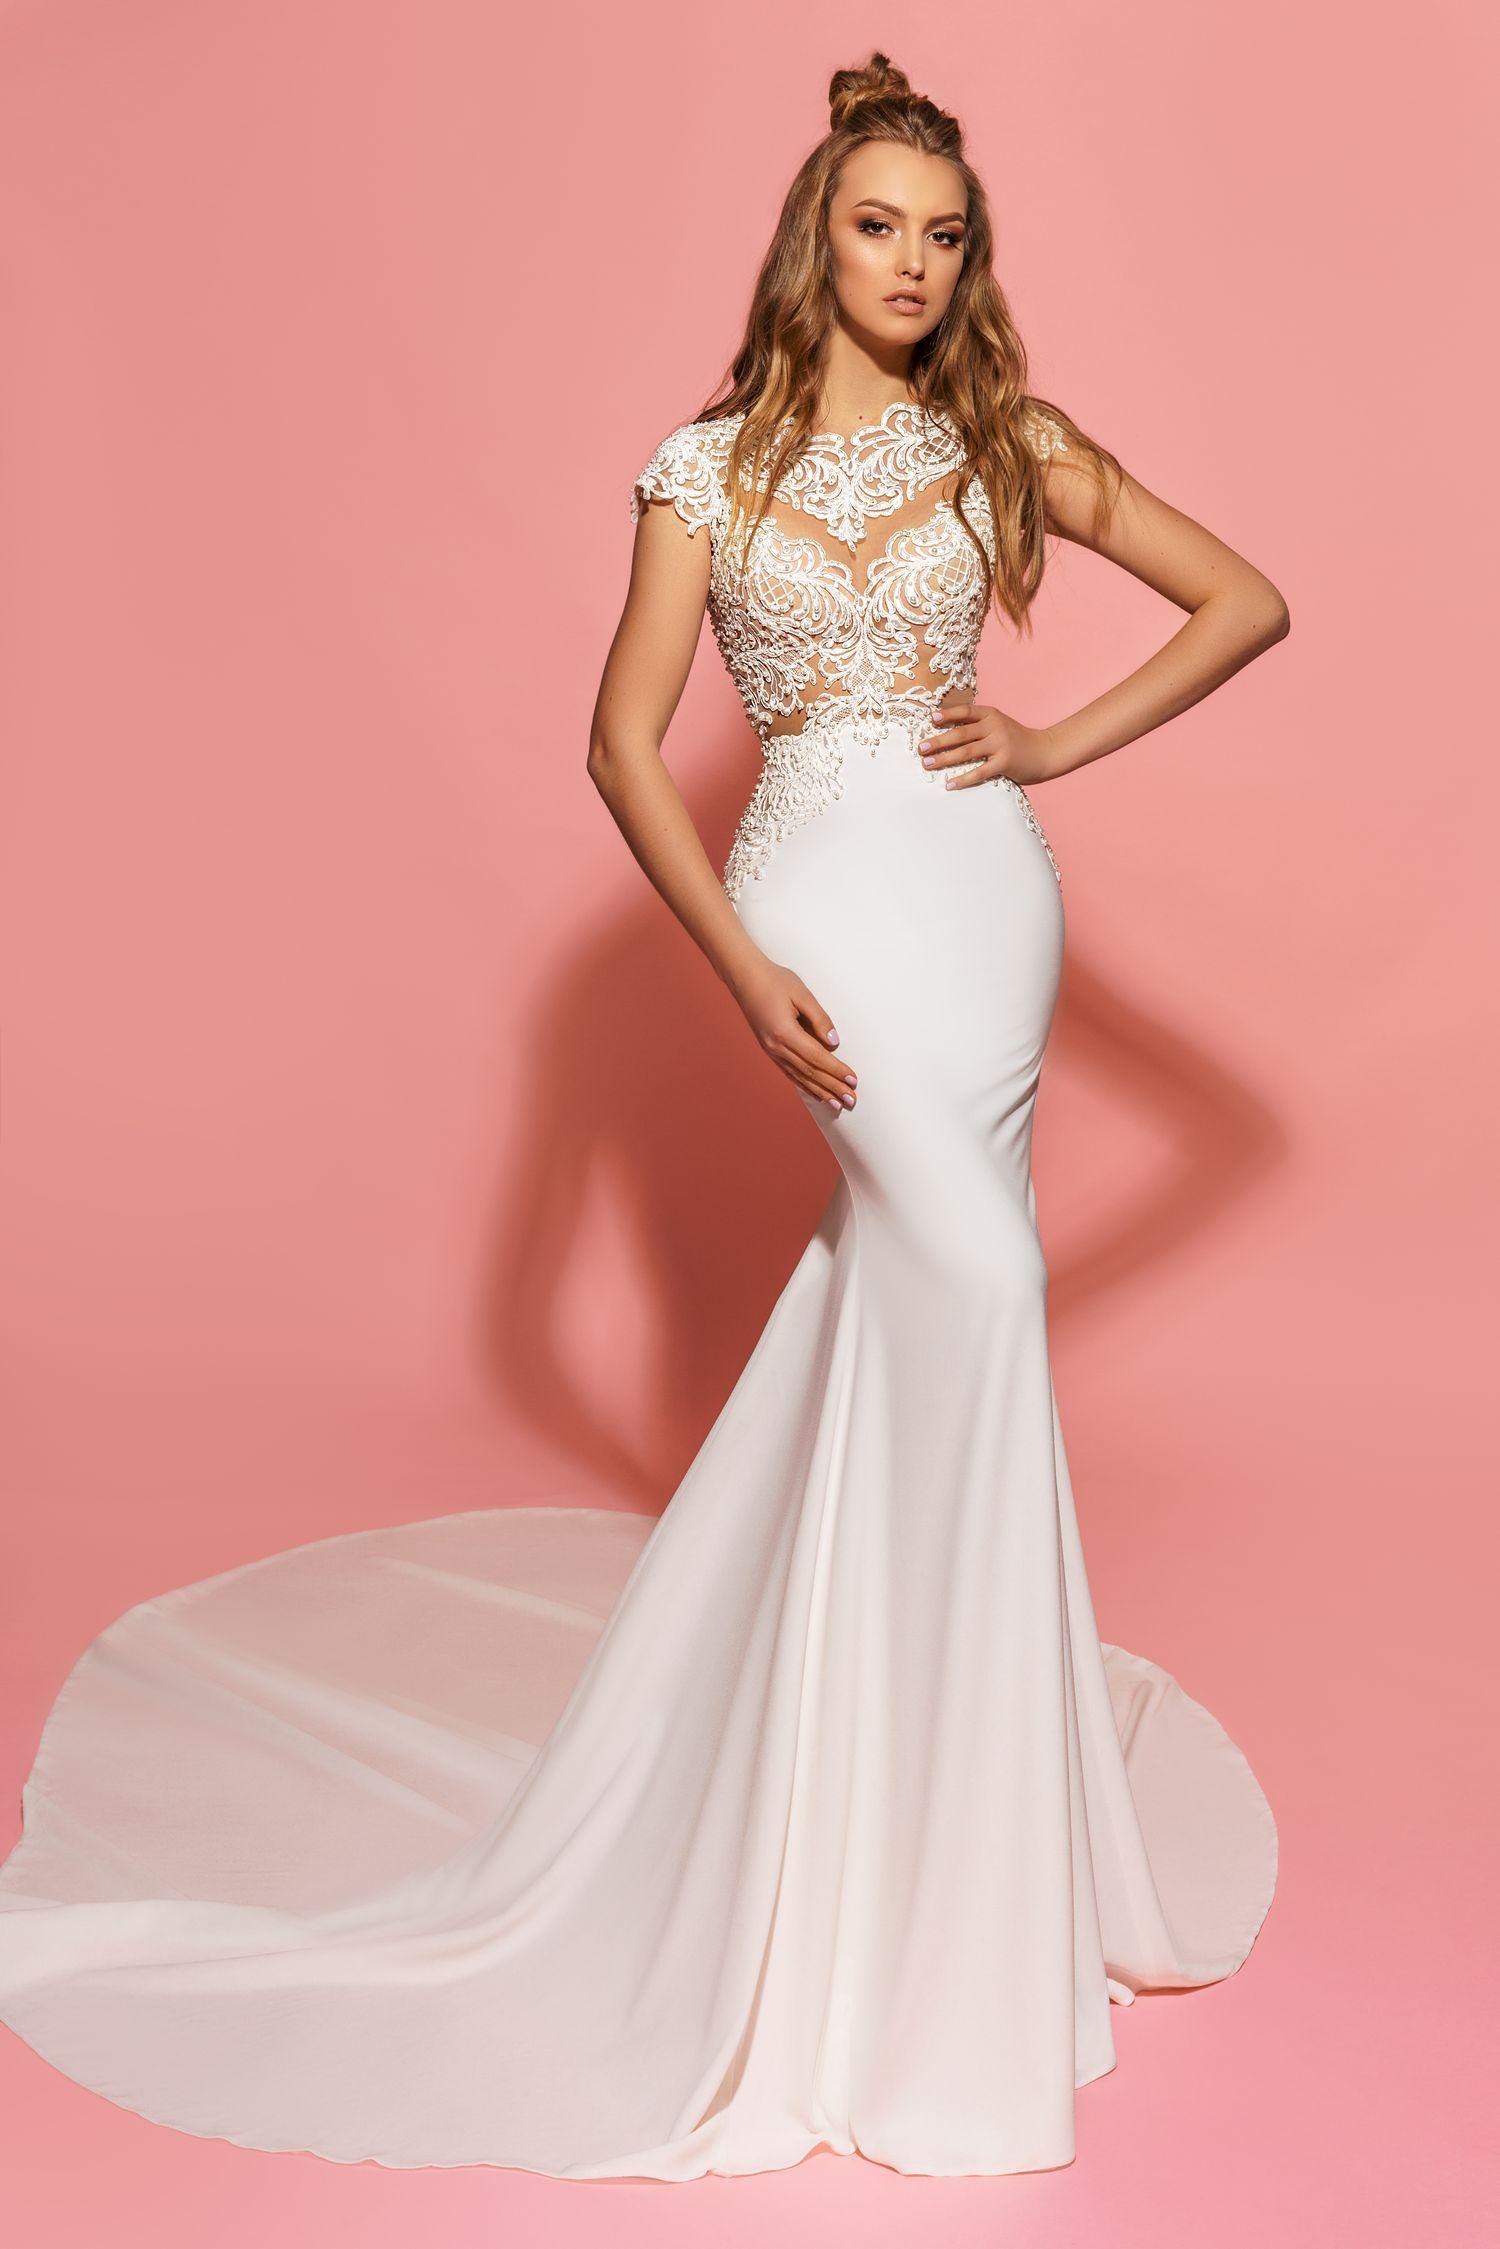 Sintia | Dresses | Pinterest | Wedding dress, Weddings and Wedding